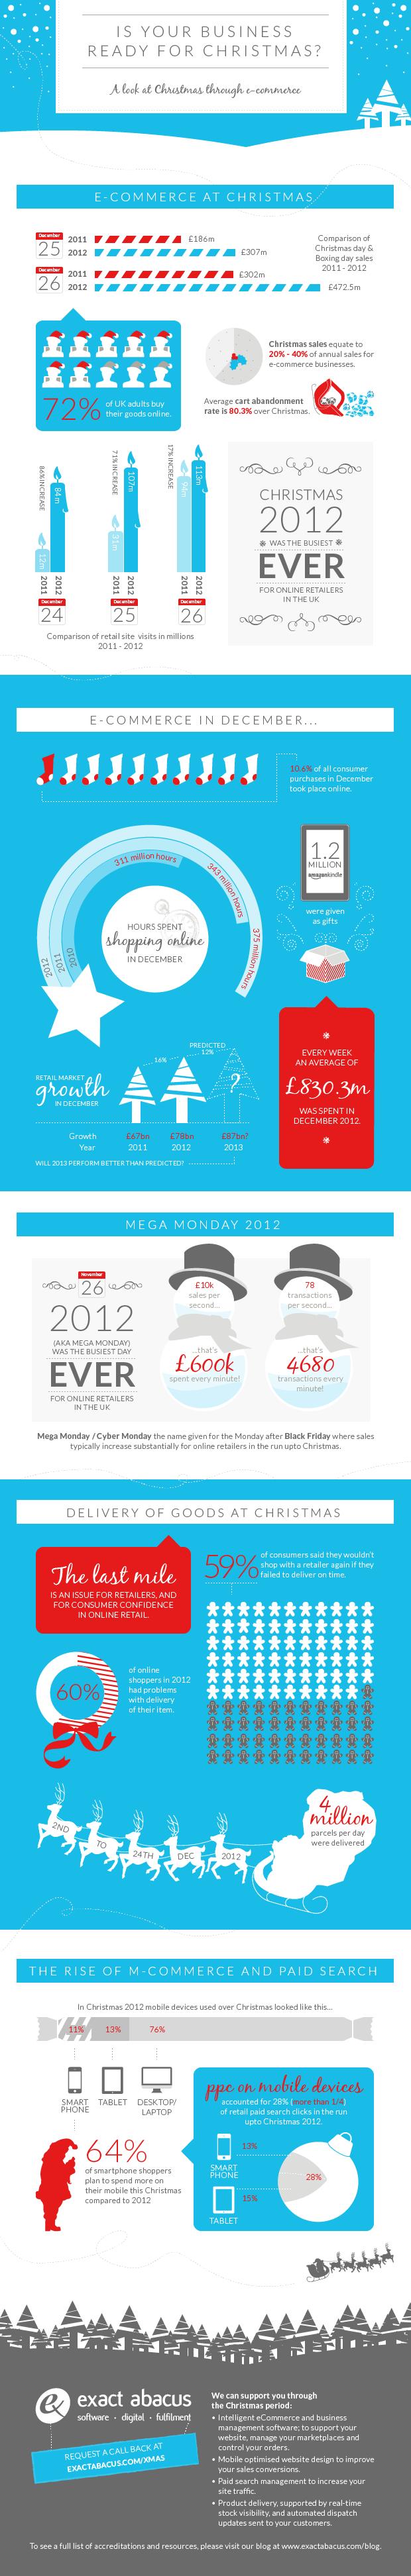 Exact-Abacus-Christmas-Infographic-Blog